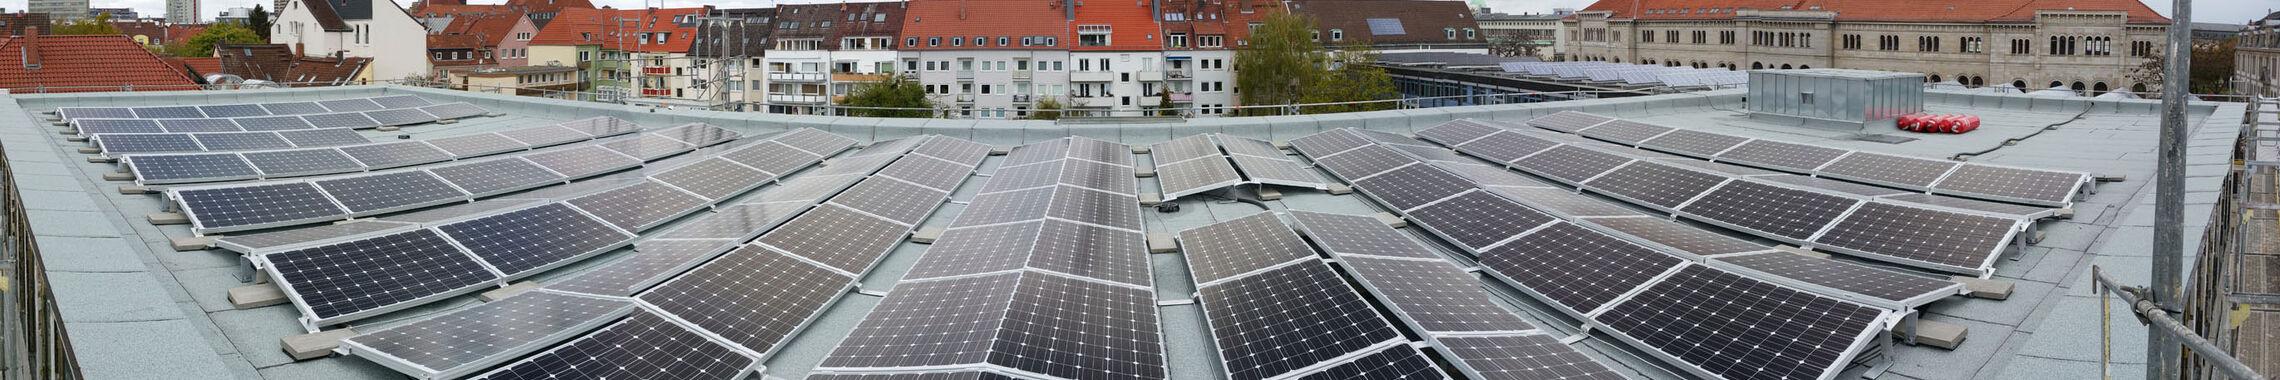 photovoltaik_brandstrasse_panorama_1-2_kopfgrafik